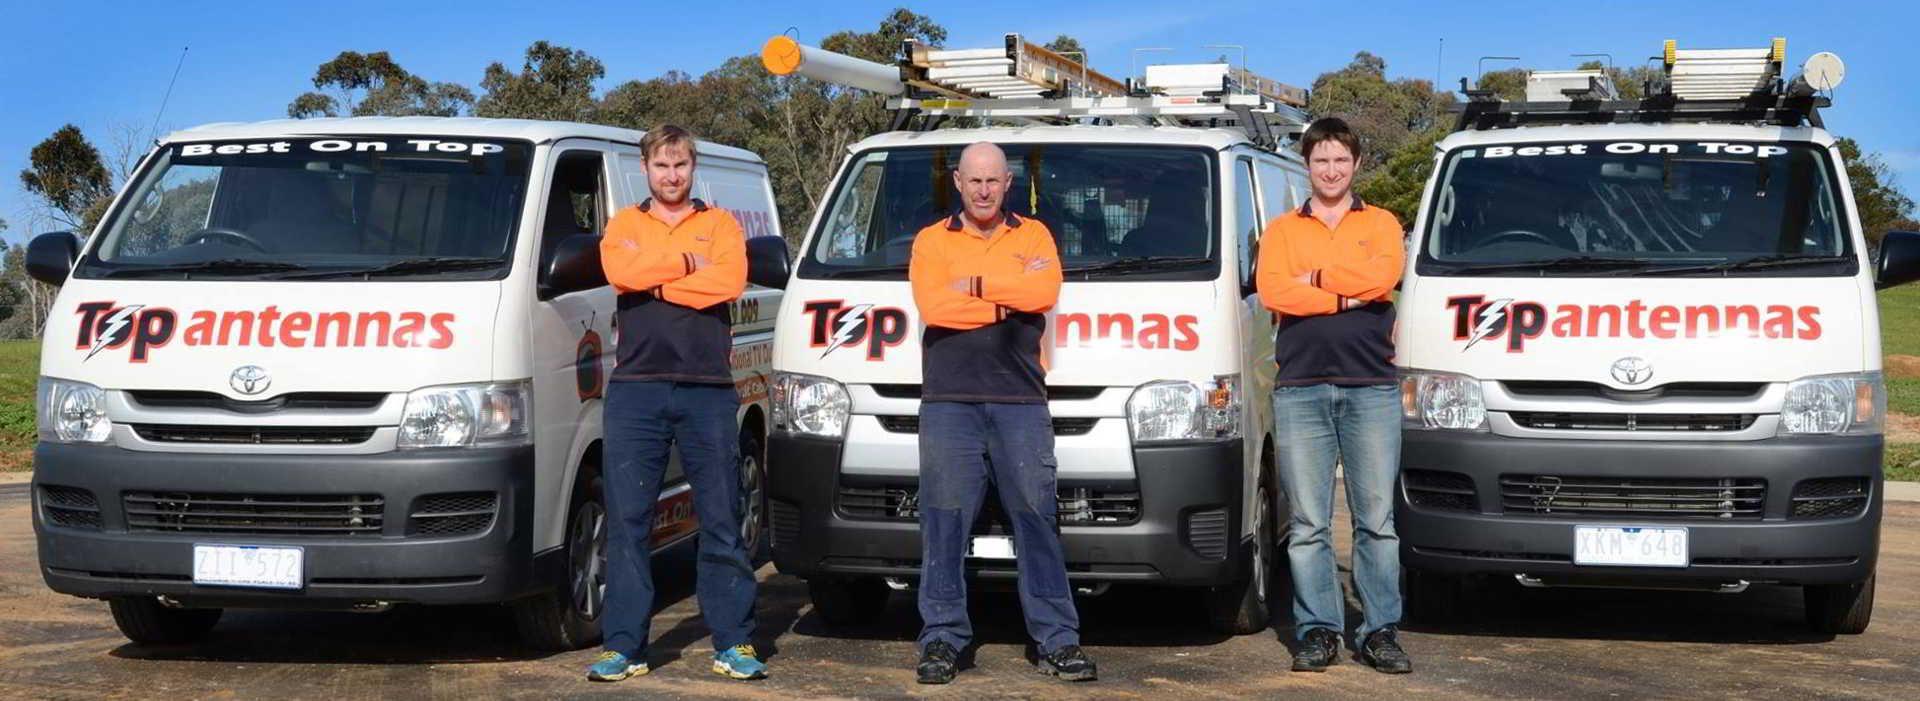 Top Antennas - Albury Wodonga Business